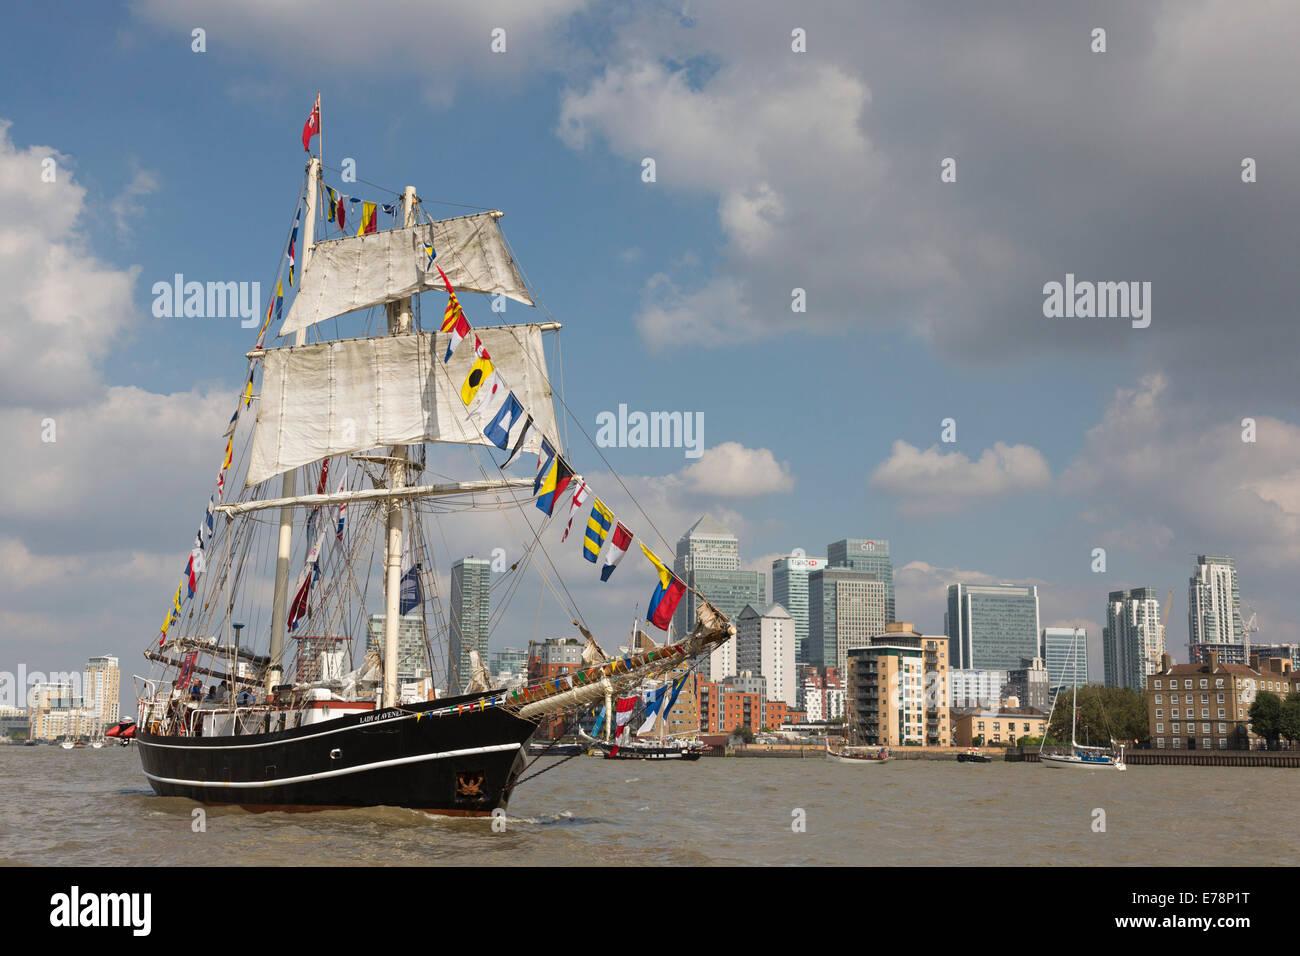 london-uk-9-september-2014-pictured-tall